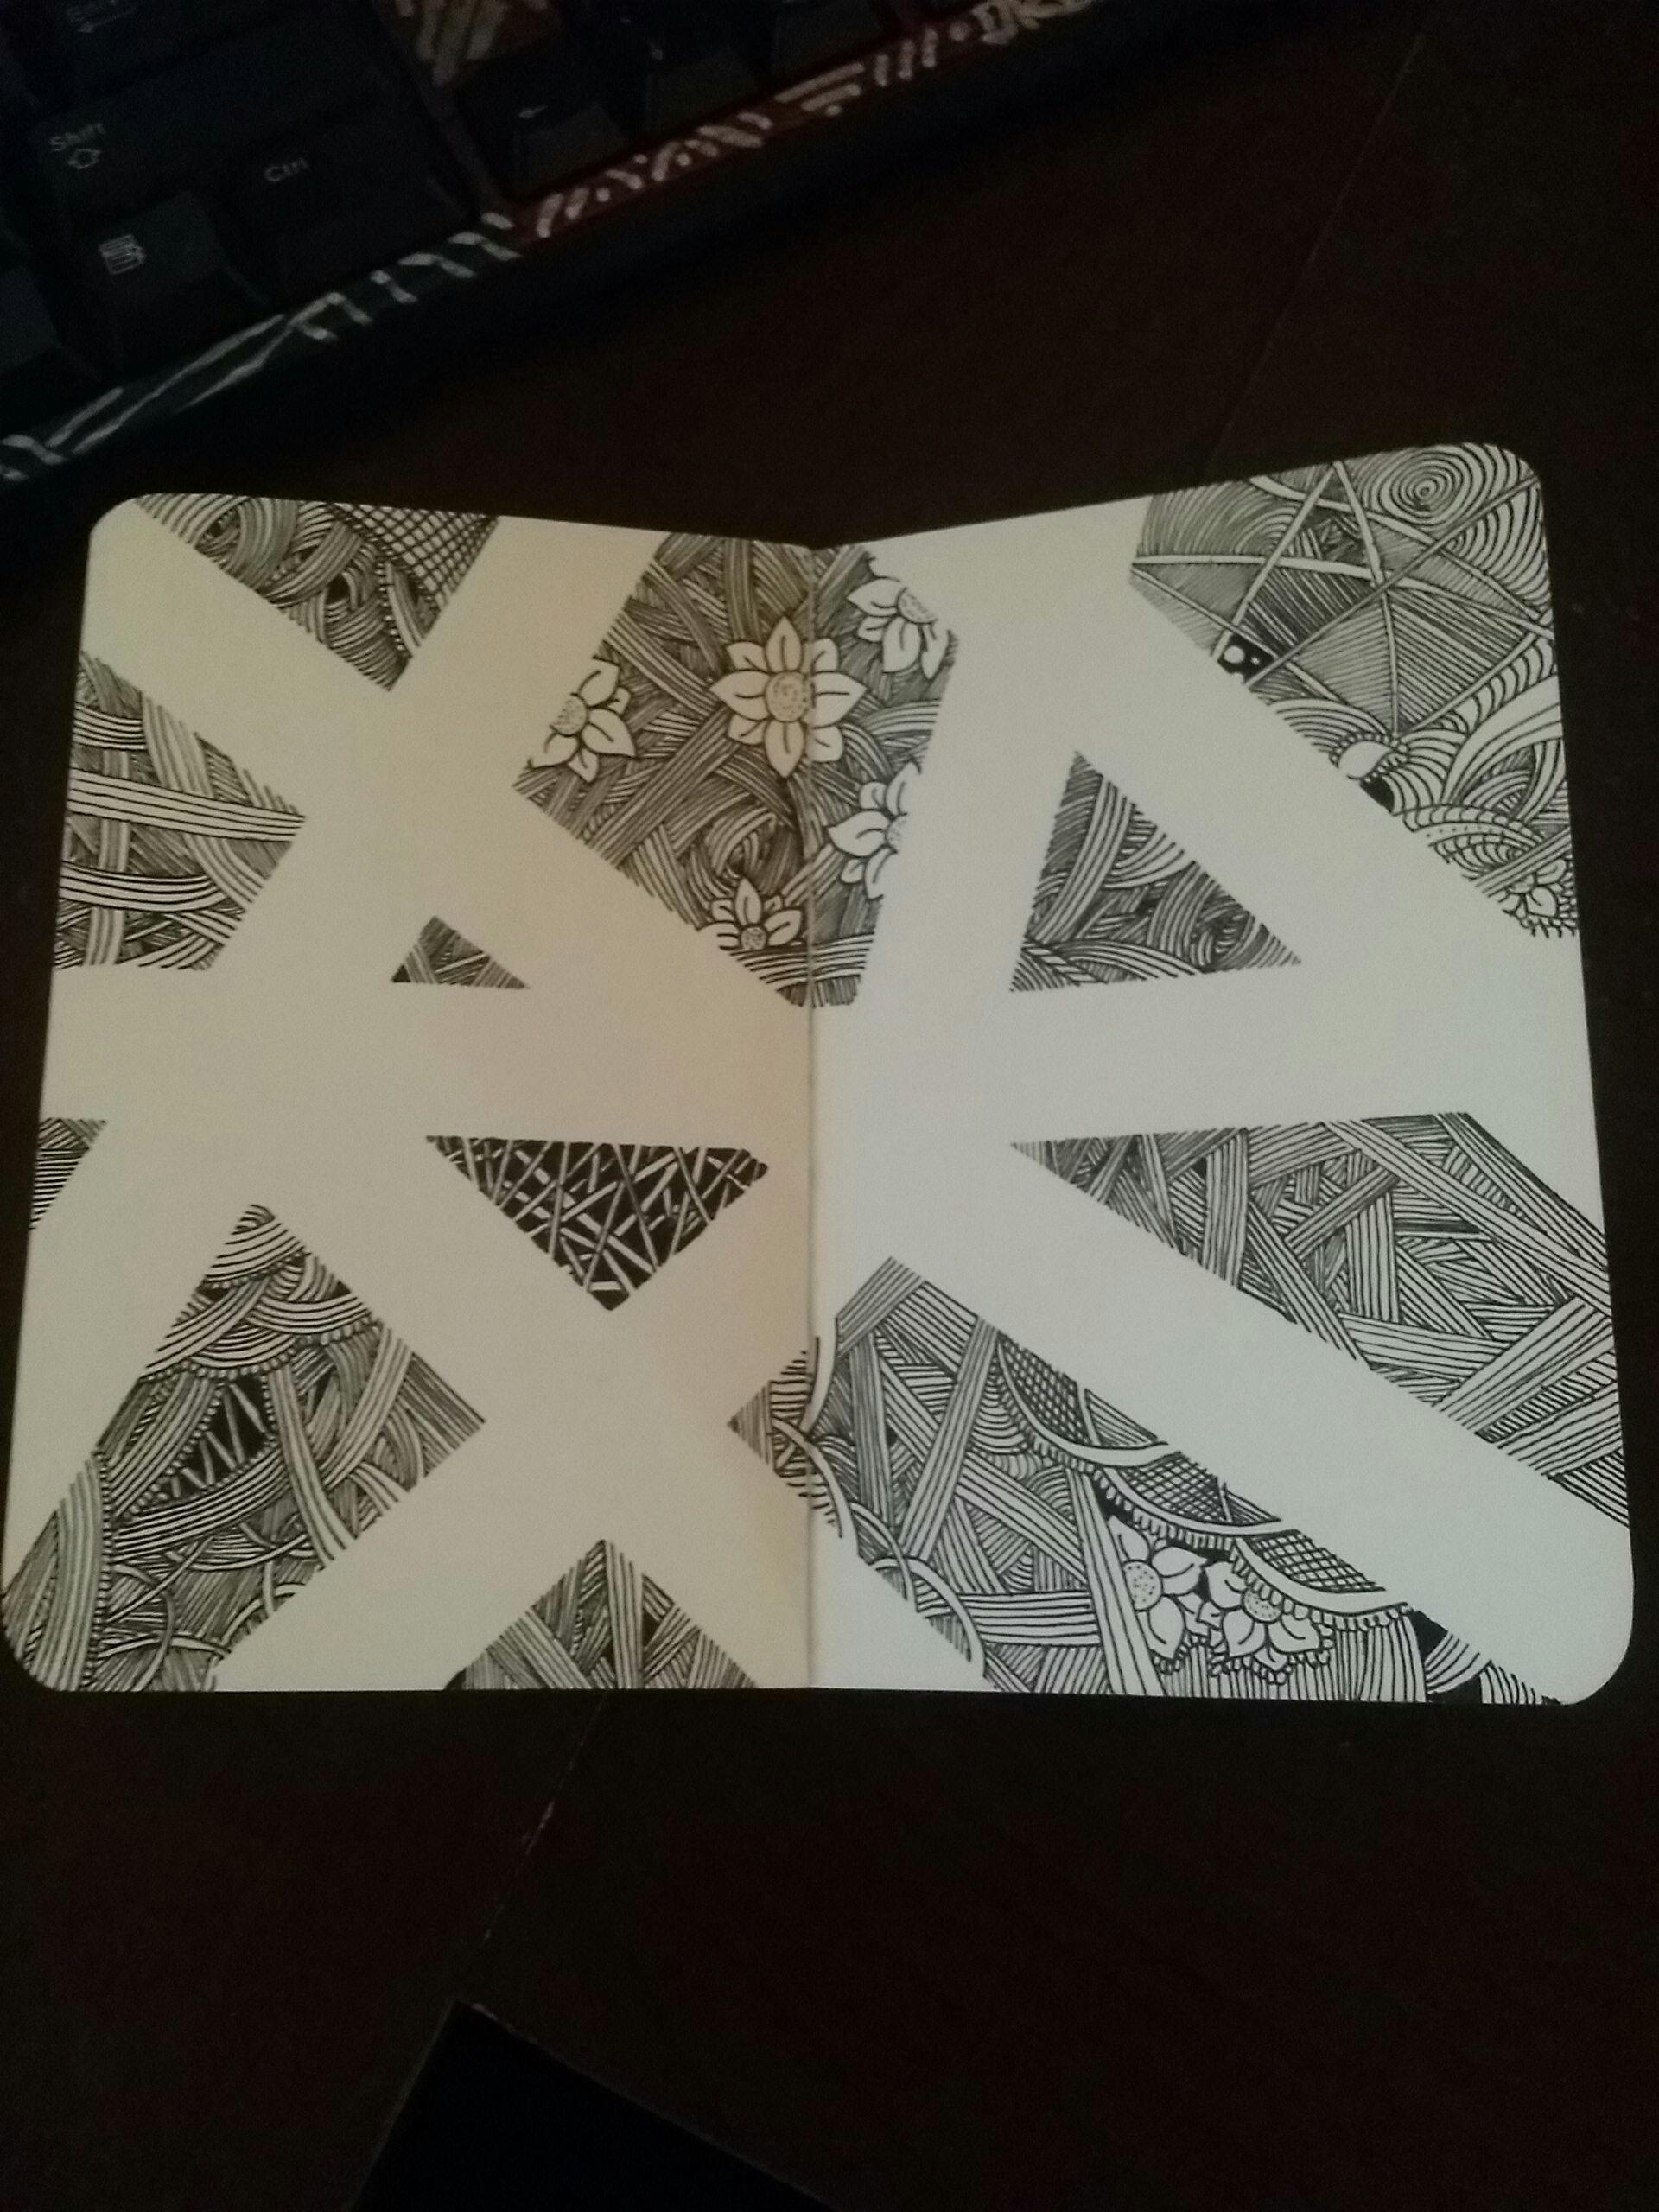 Fun sketchbook doodle